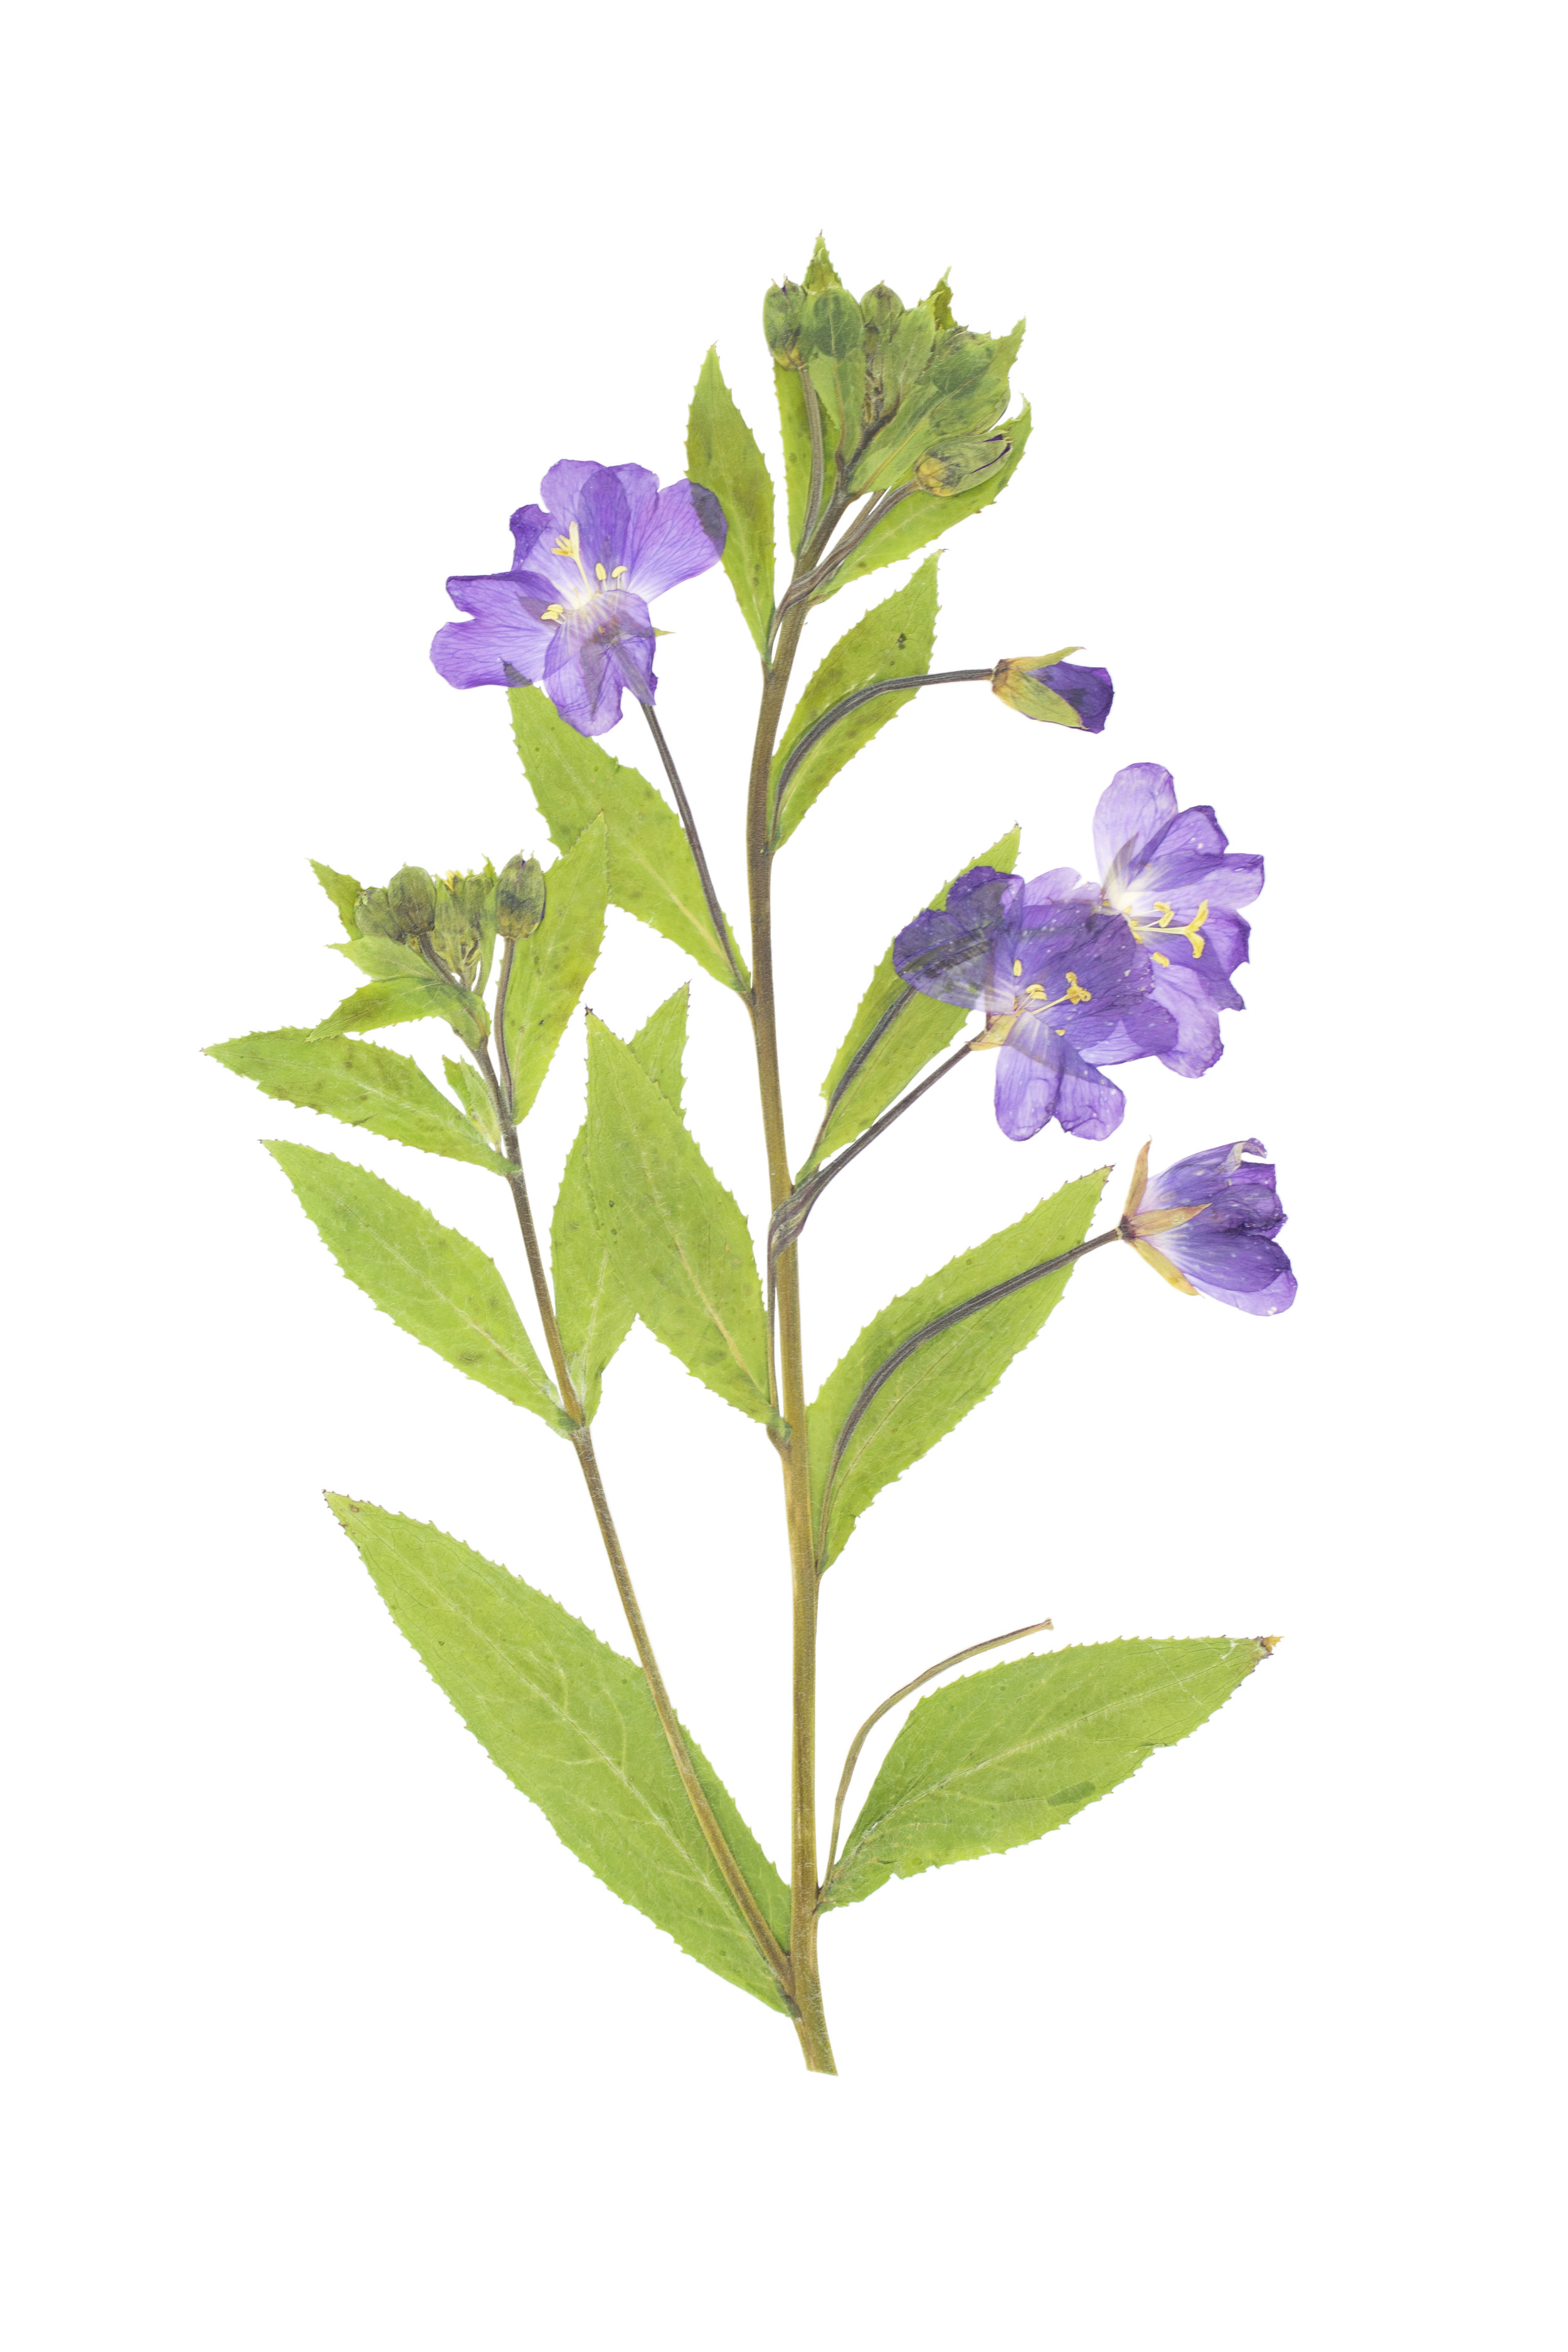 Great Willowherb / Epilobium hirsutum